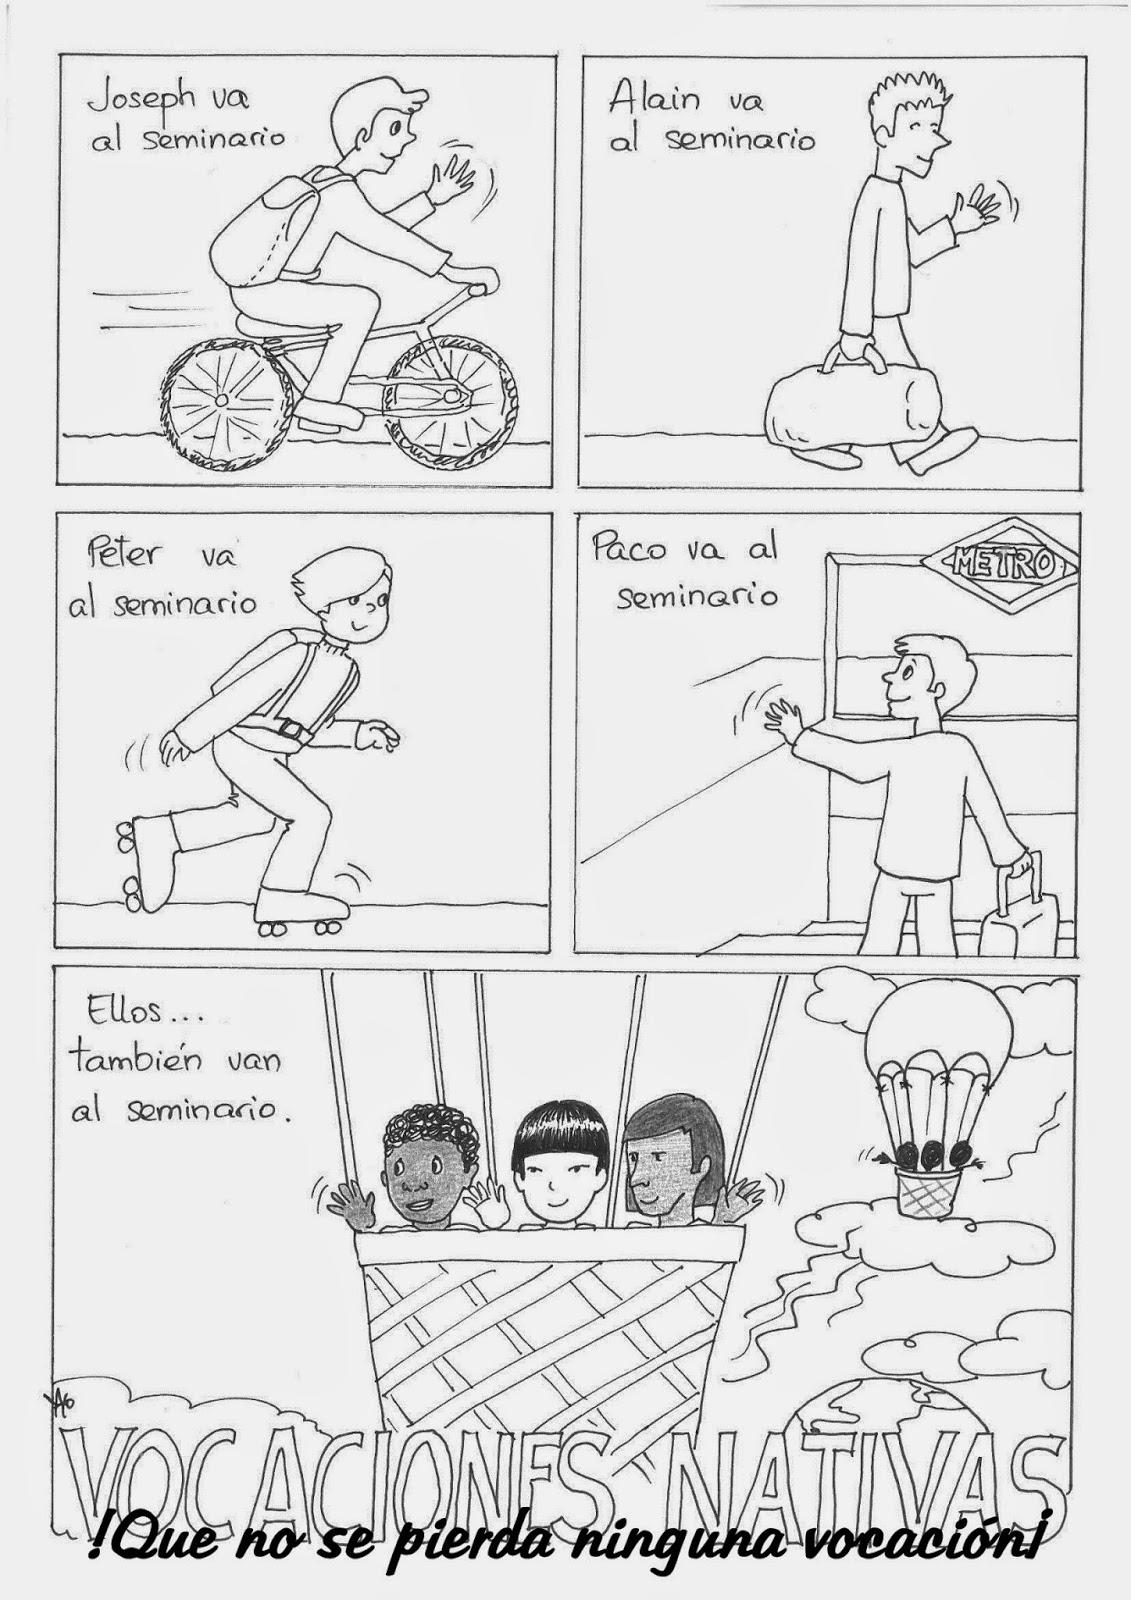 Comic de Vocaciones Nativas ~ Guadalajara Misionera